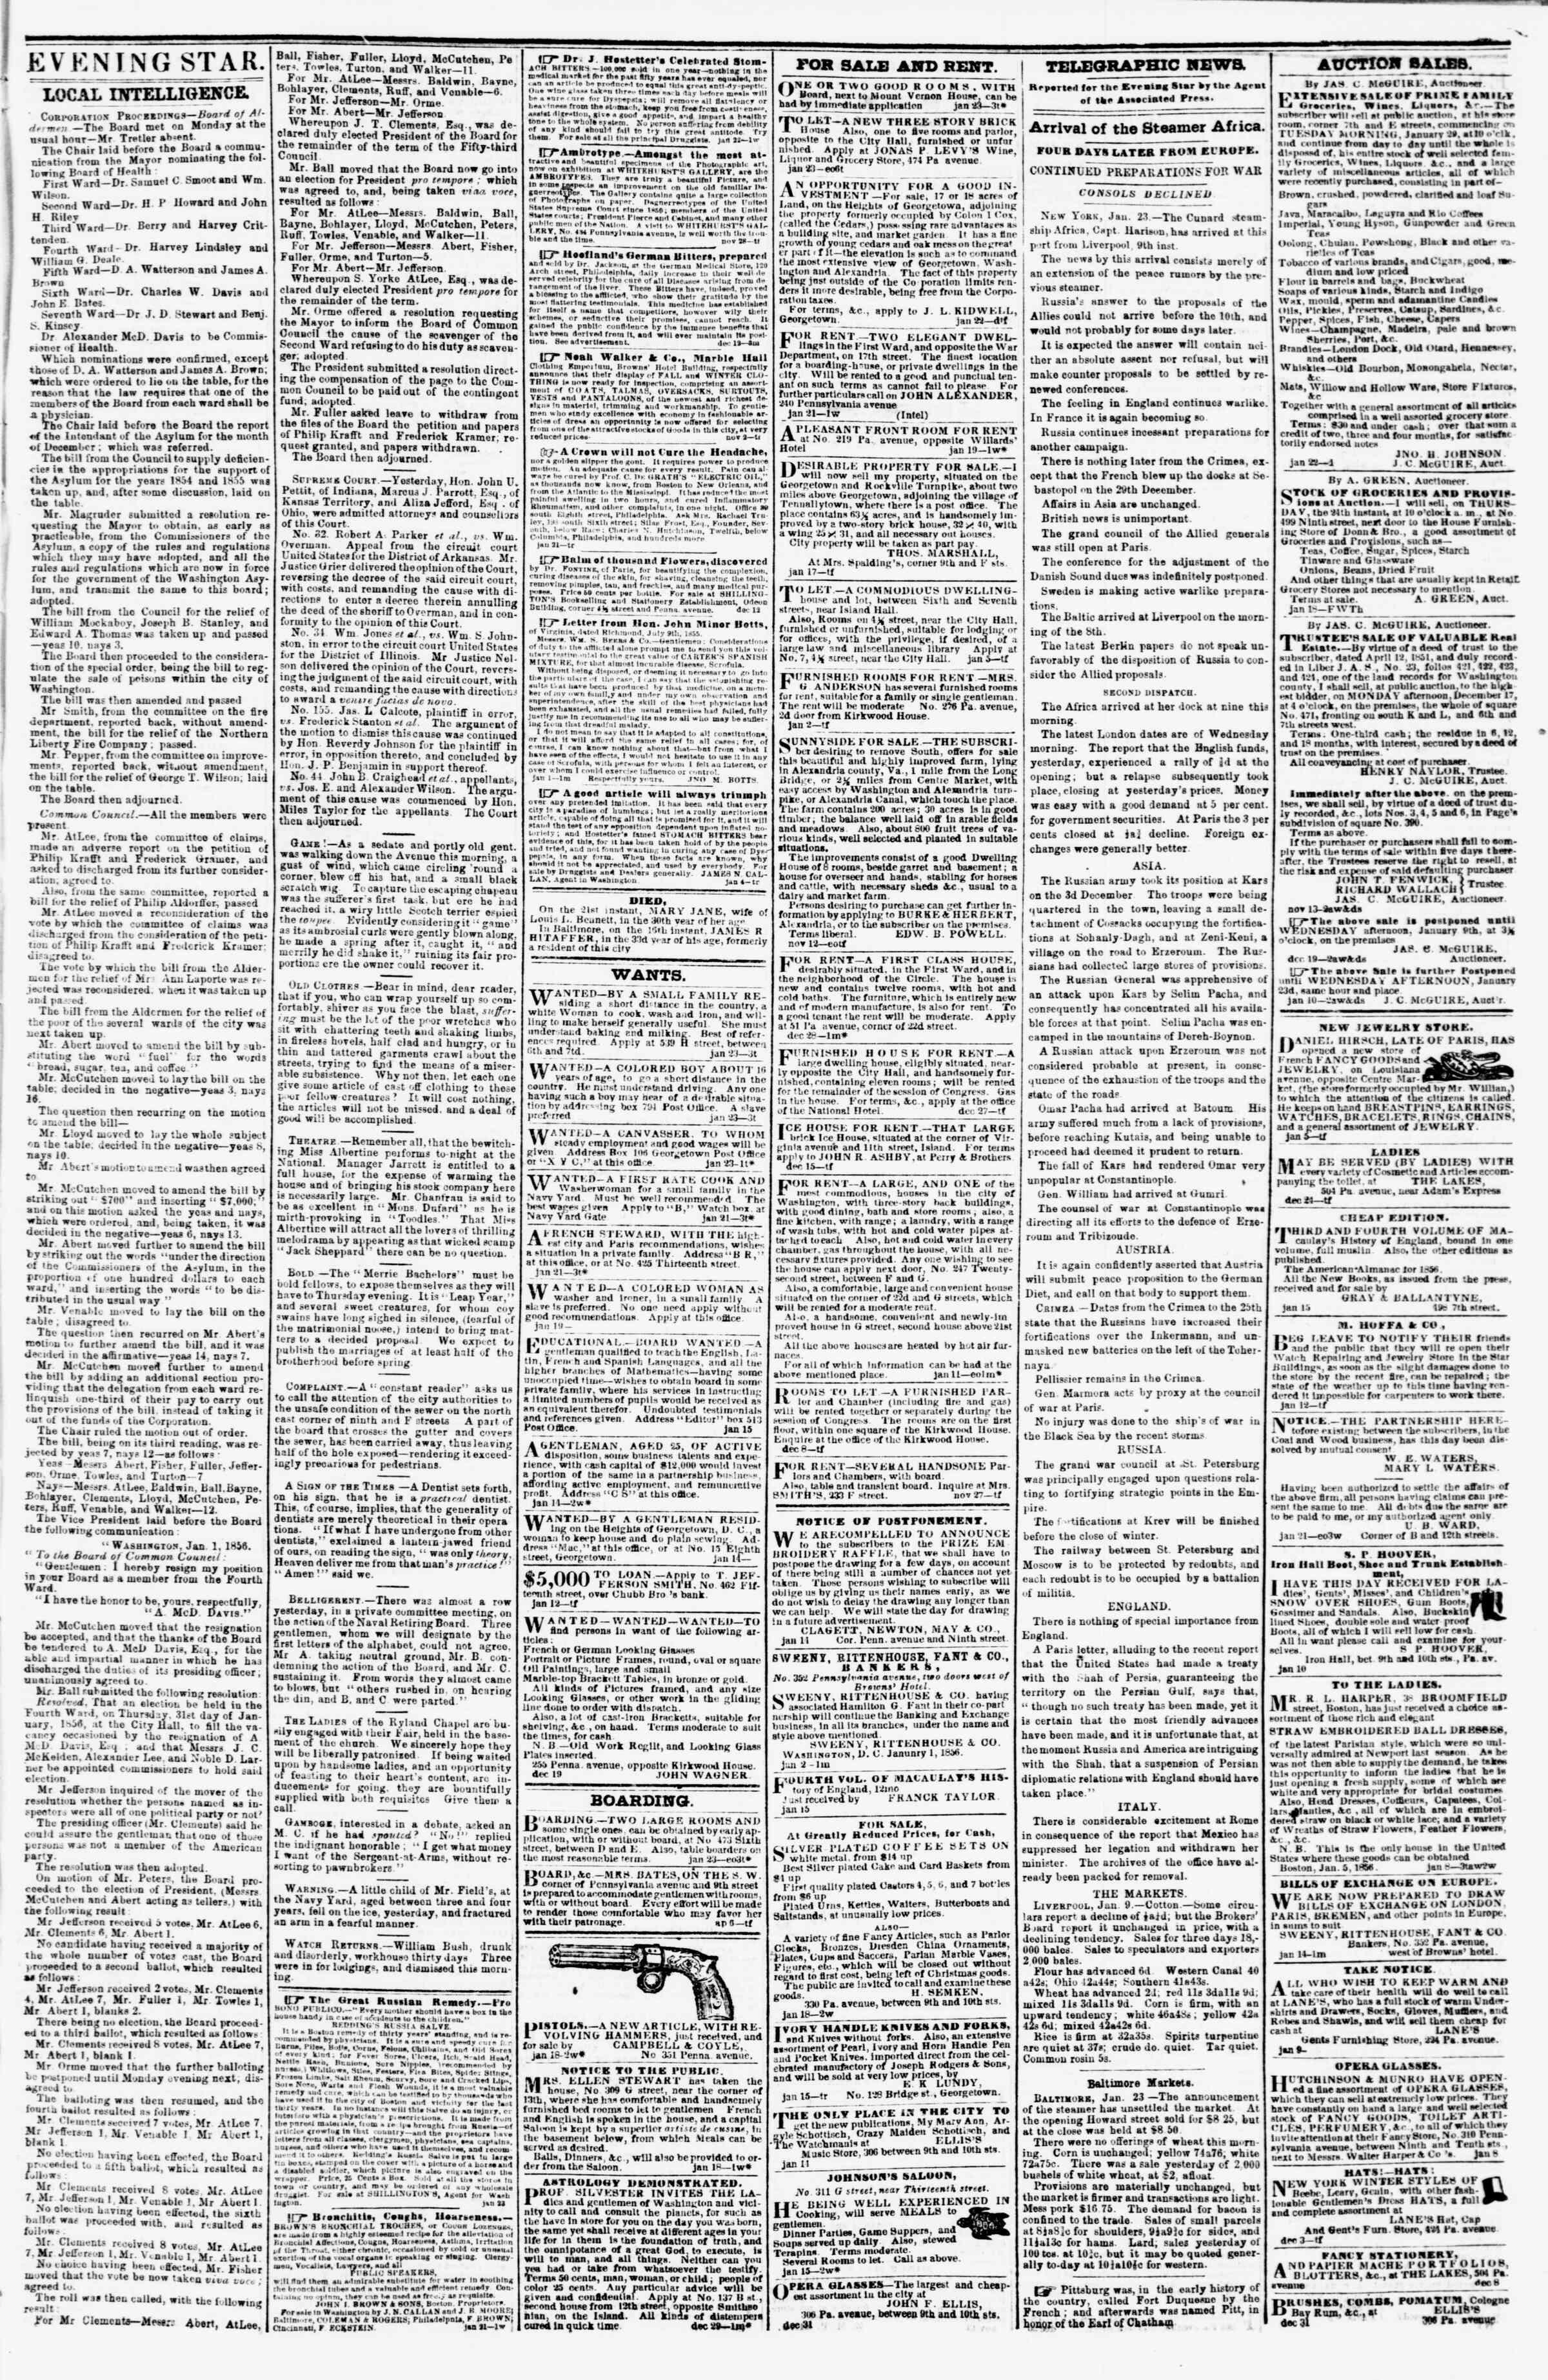 Newspaper of Evening Star dated 23 Ocak 1856 Page 3